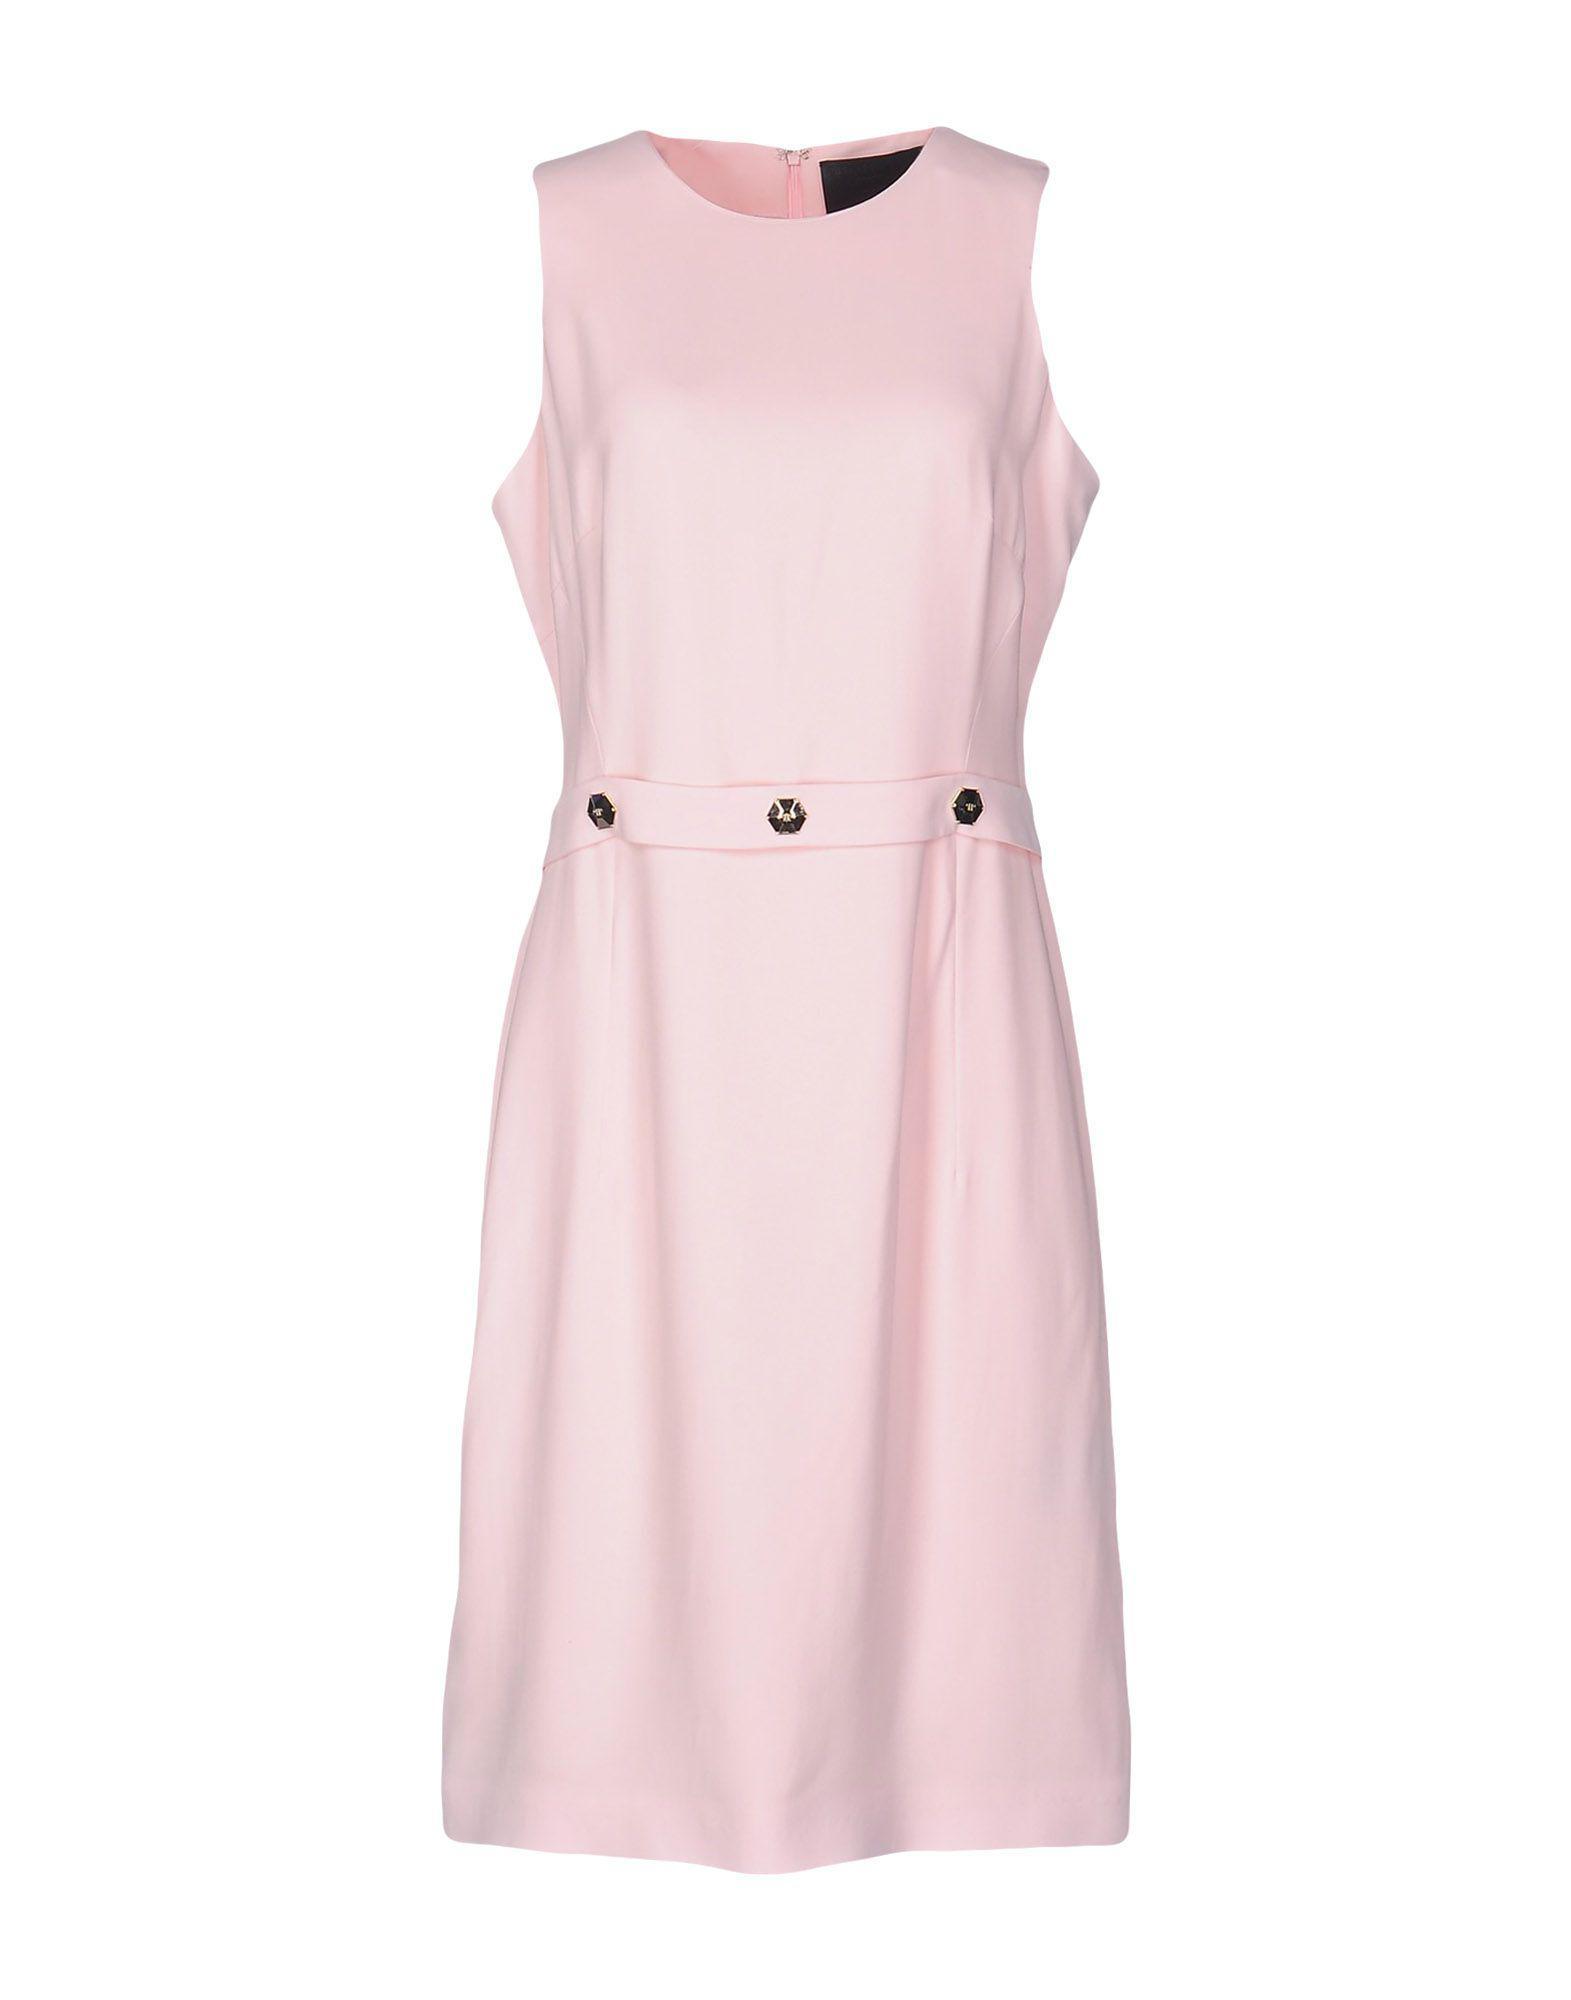 DRESSES - Knee-length dresses Philipp Plein 2G7zGCaCM